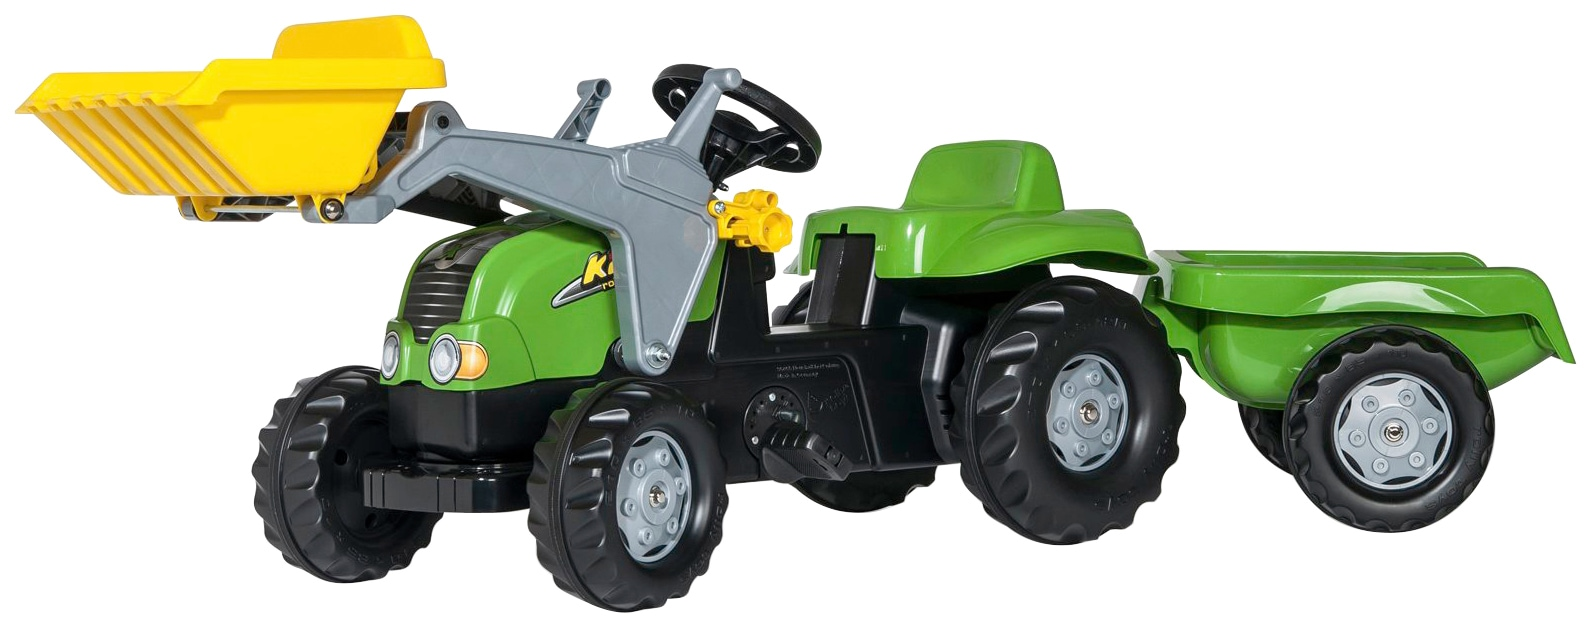 Rolly Toys Tretfahrzeug, Traktor mit Trailer und Lader grün Kinder Kettcar Tretfahrzeug Kinderfahrzeuge